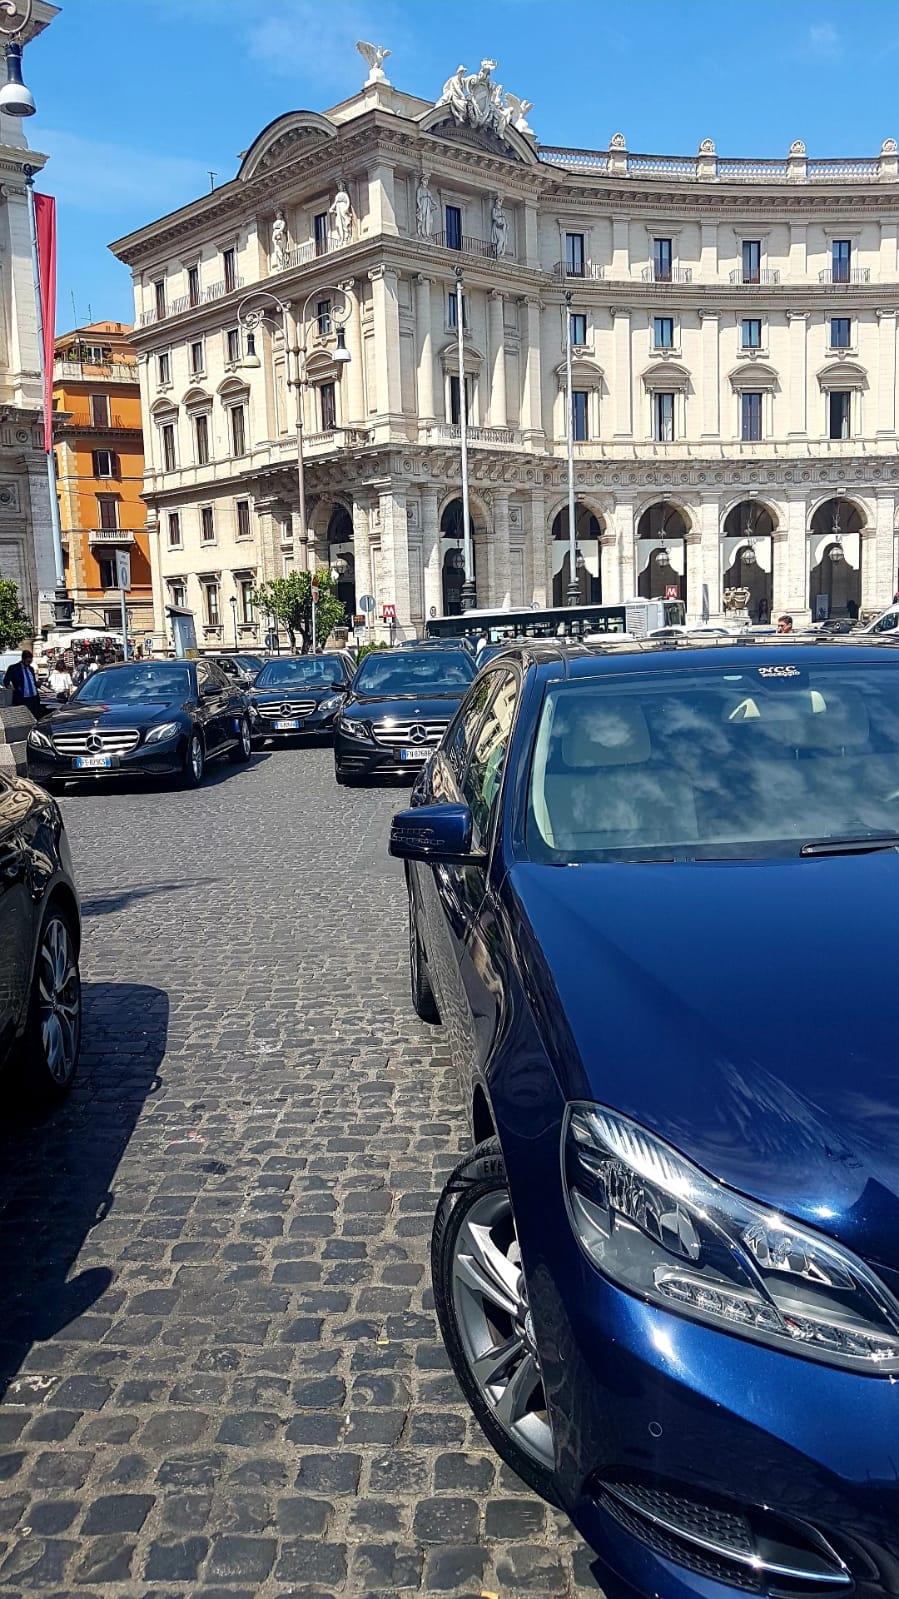 Noleggio con conducente Roma